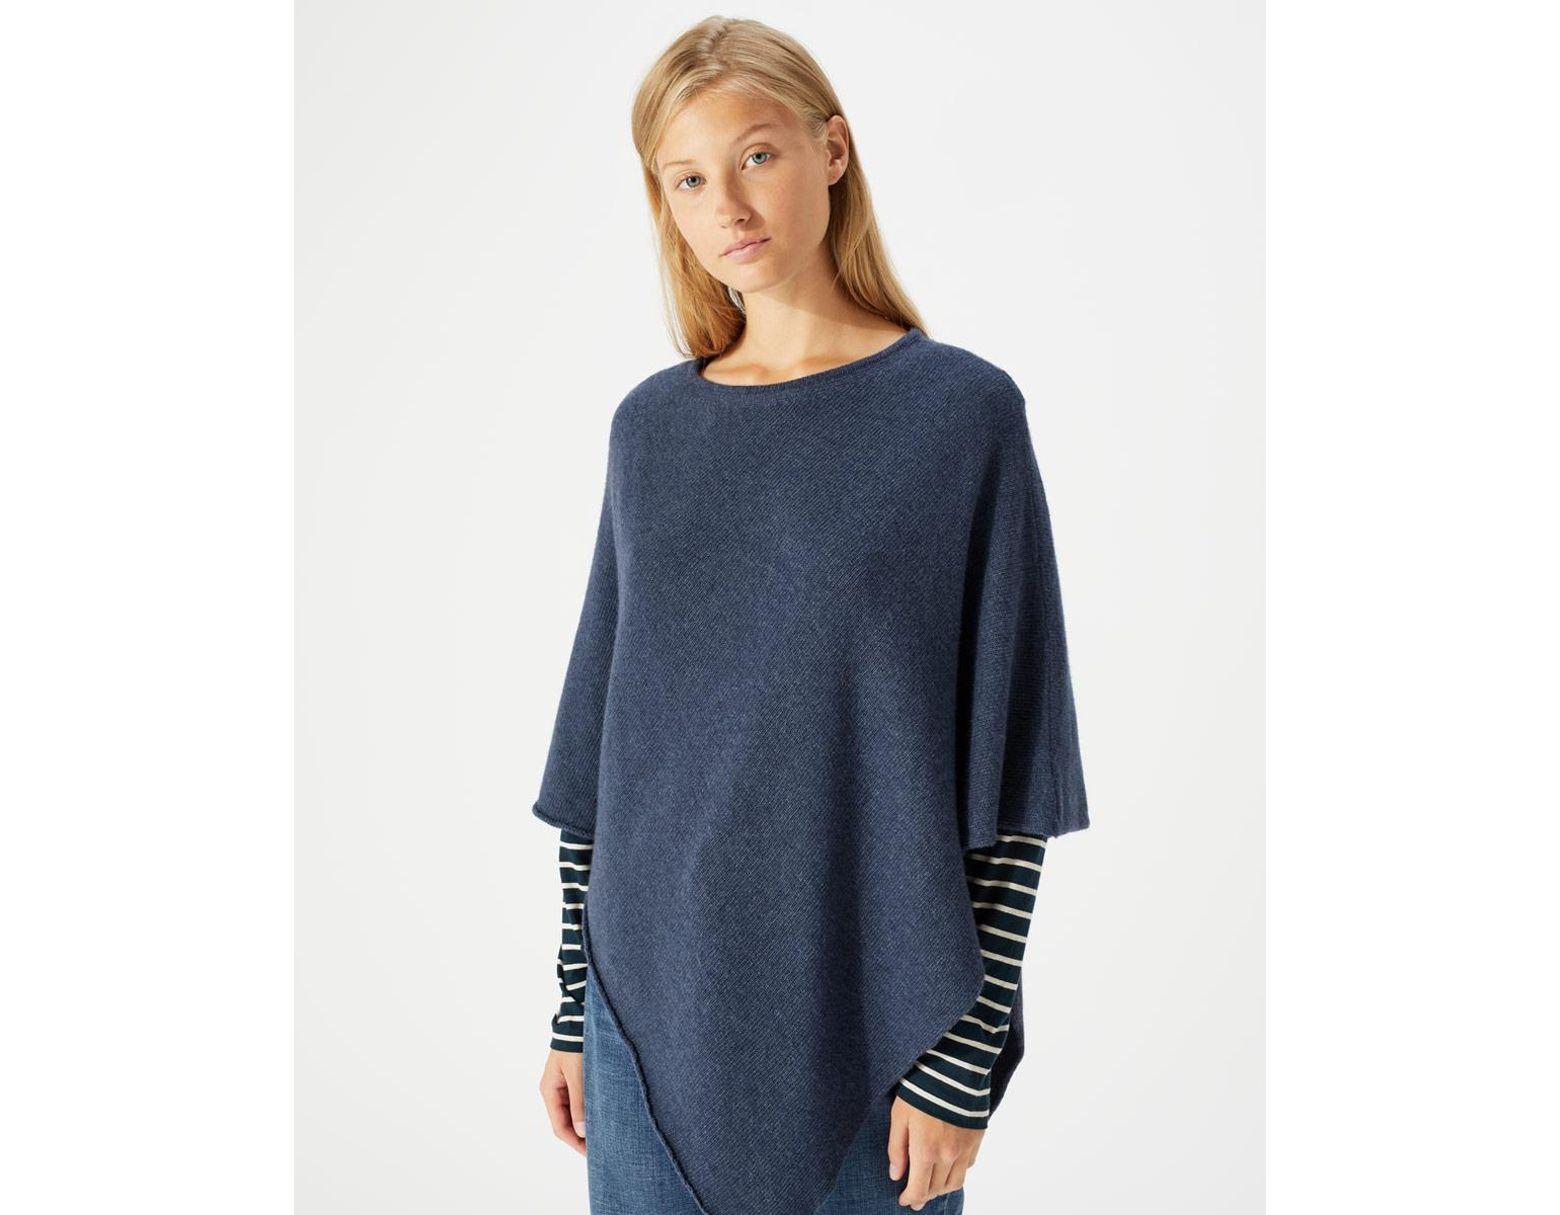 b3803b5a7 Jigsaw Wool Cashmere Blend Rolled Poncho in Blue - Save 20% - Lyst